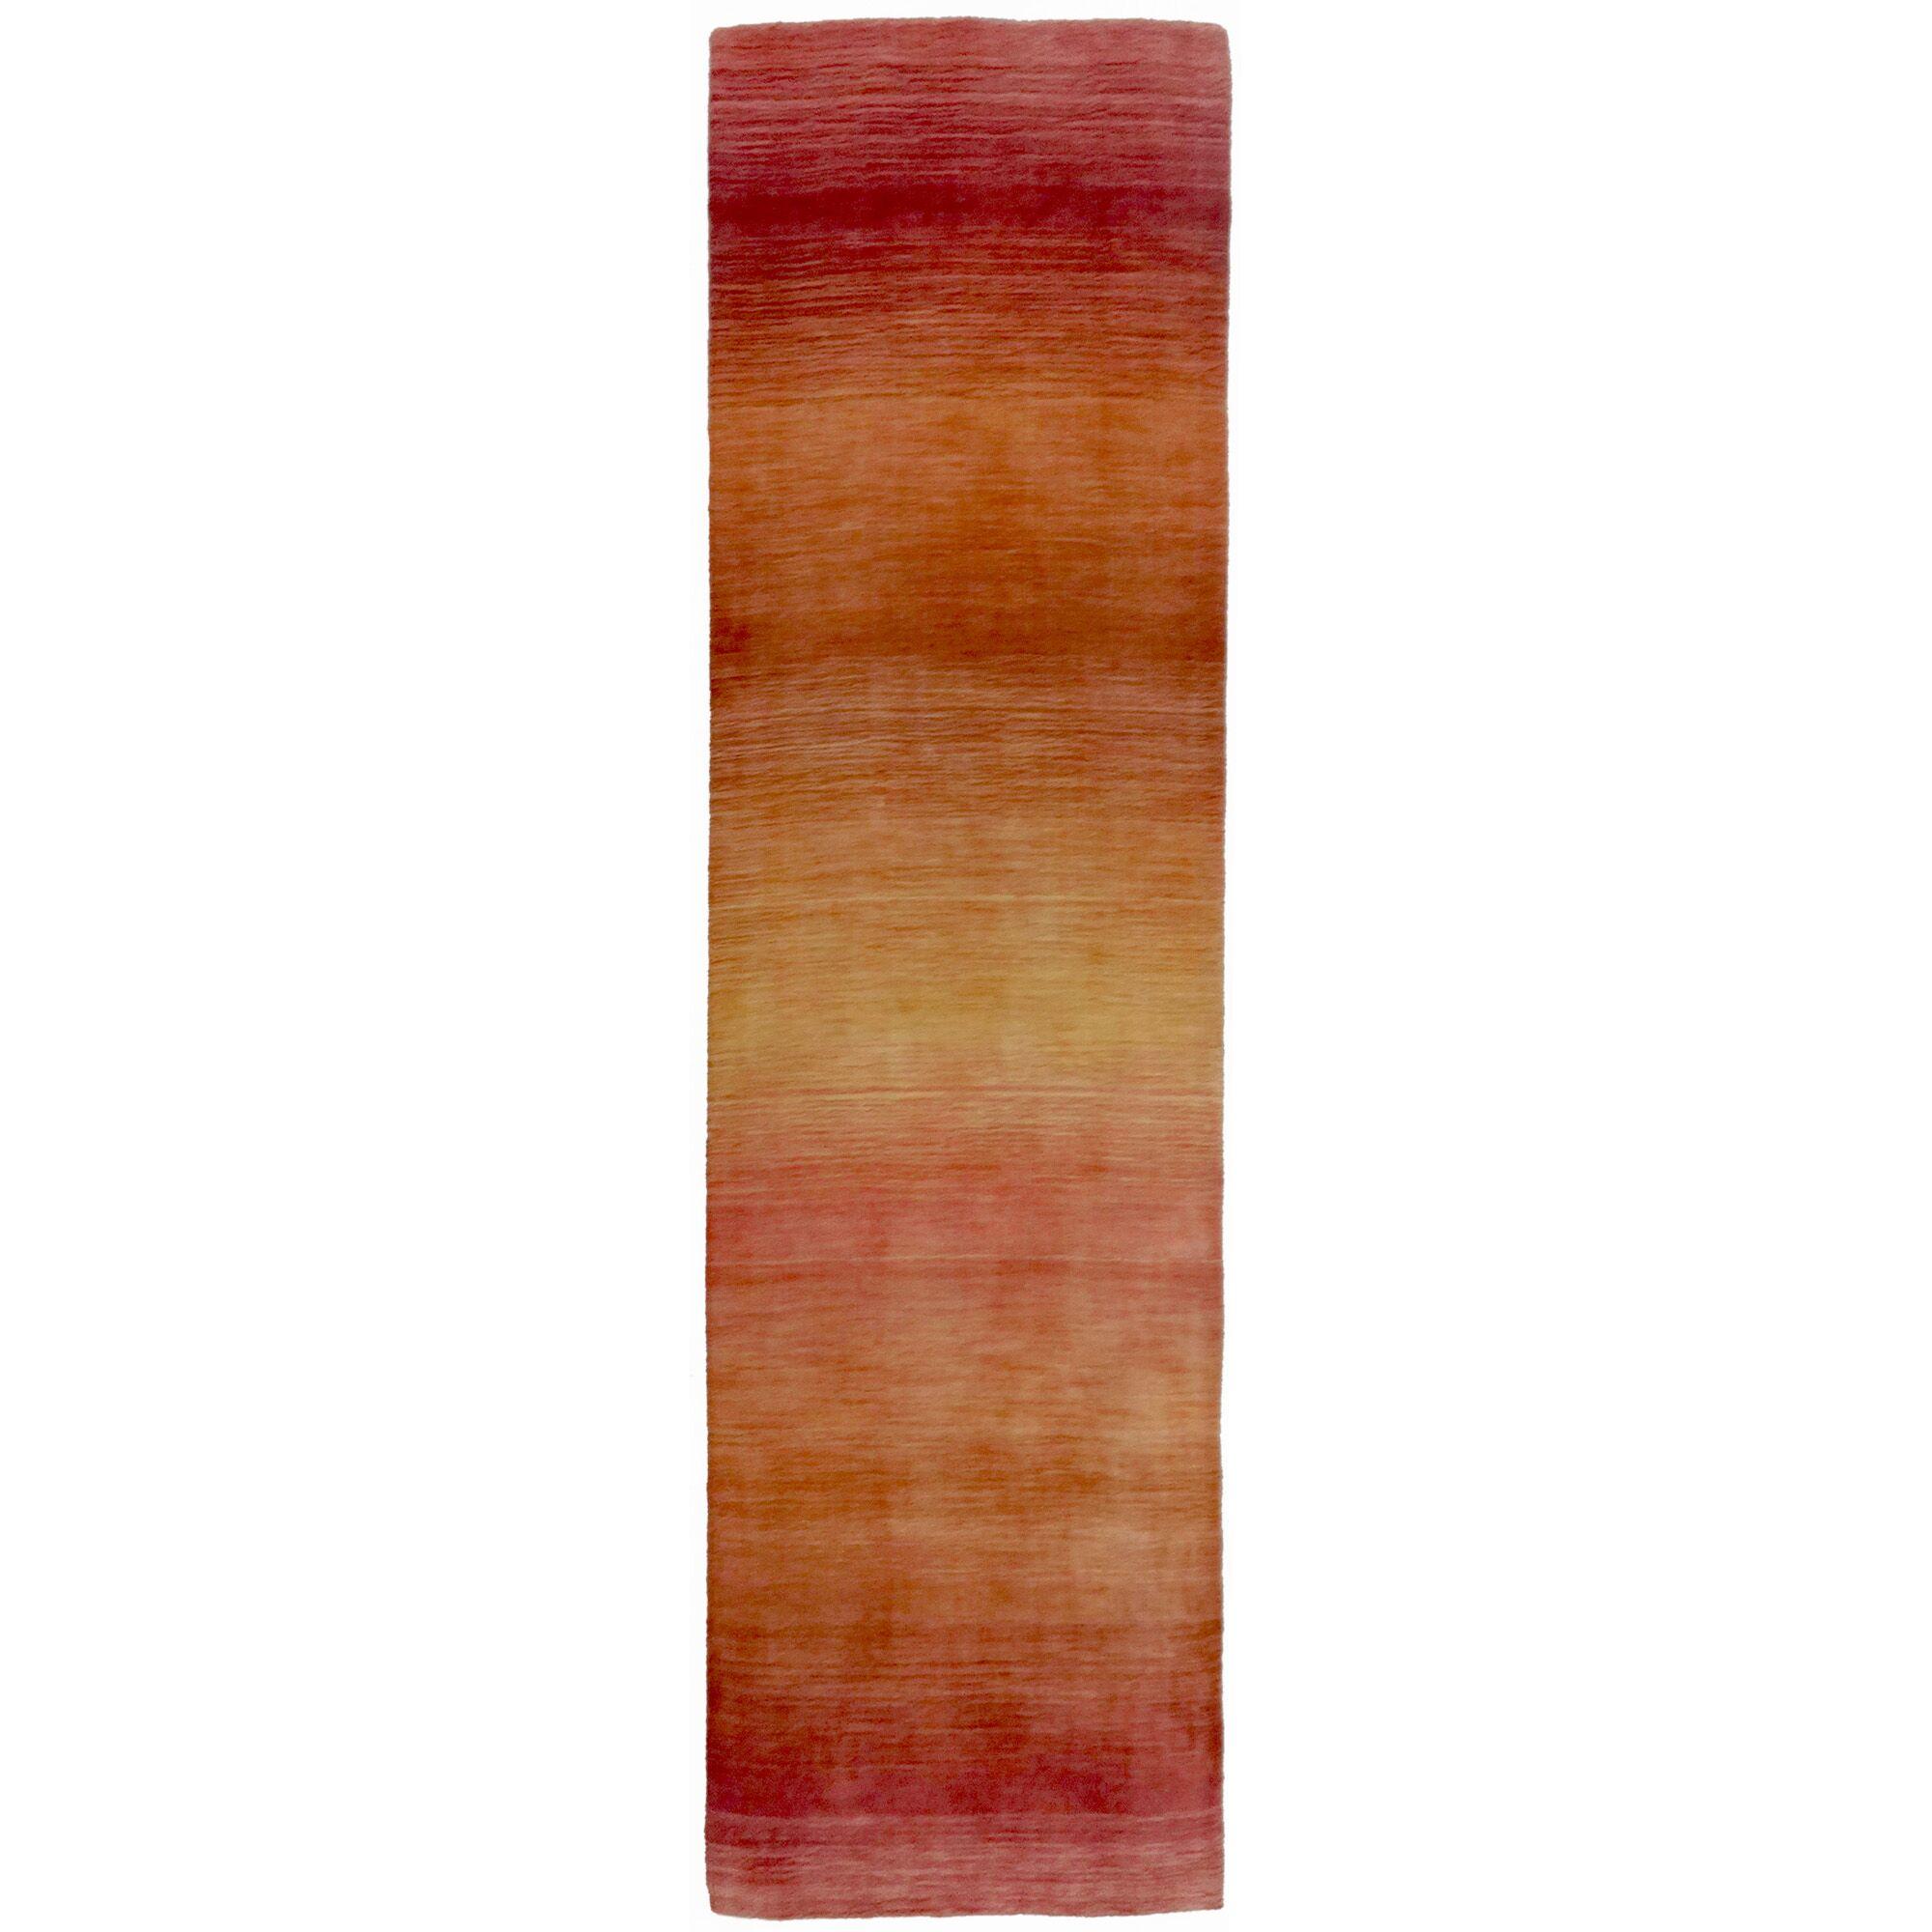 Hansford Hand-Loomed Orange Area Rug Rug Size: 8' x 10'